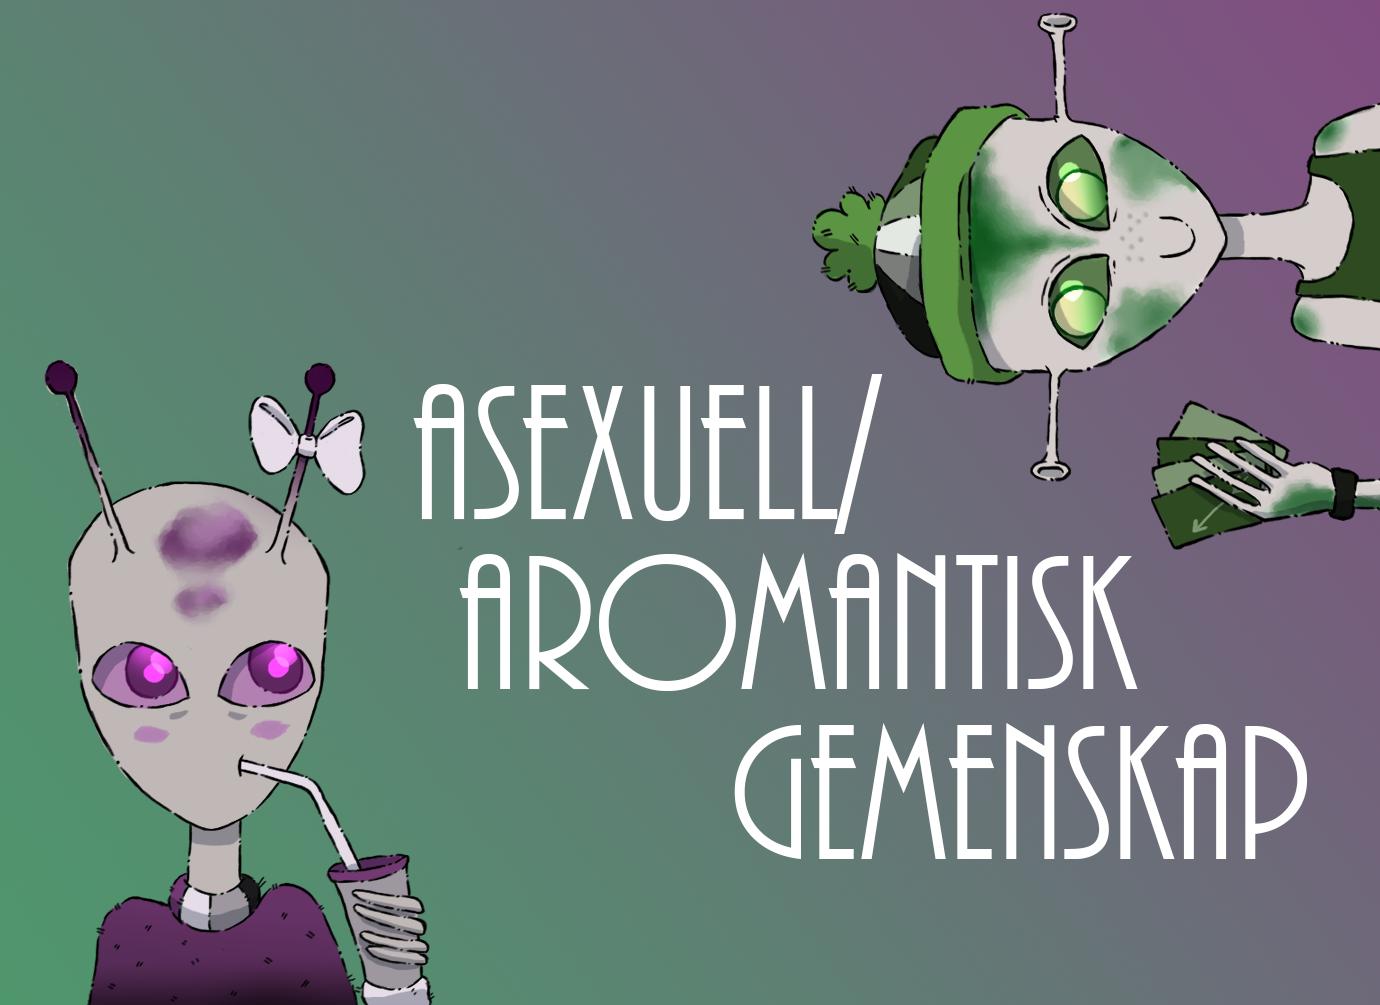 Asexuell aromantisk gemenskap